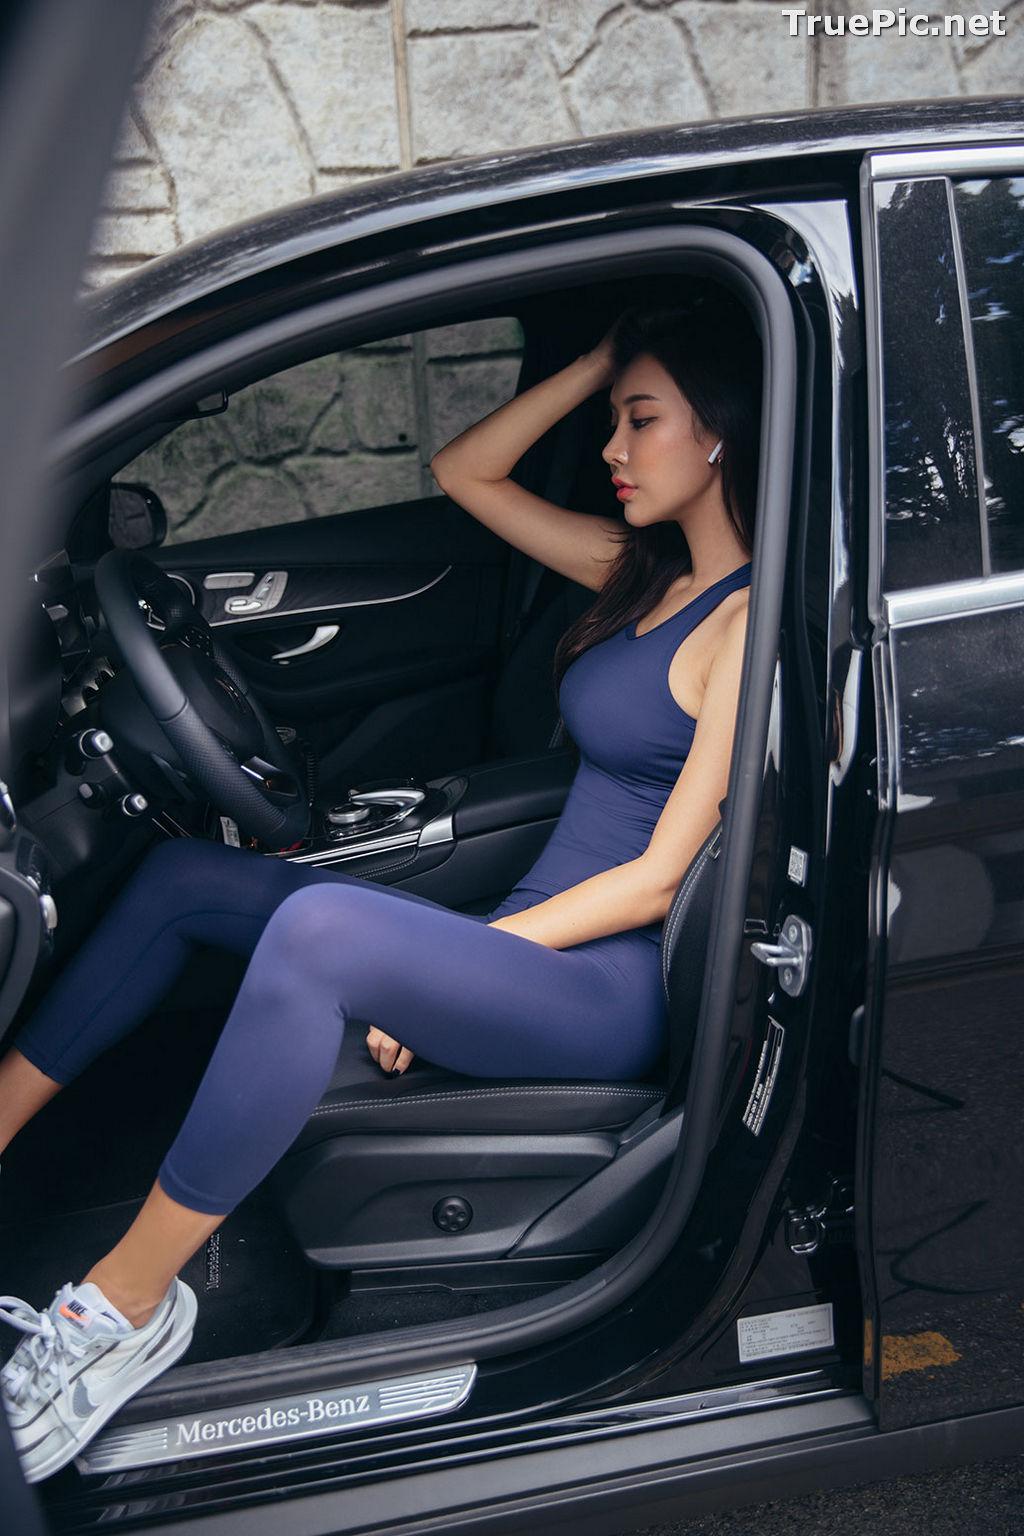 Image Korean Fashion Model - Park Da Hyun - Navy Sportswear - TruePic.net - Picture-16